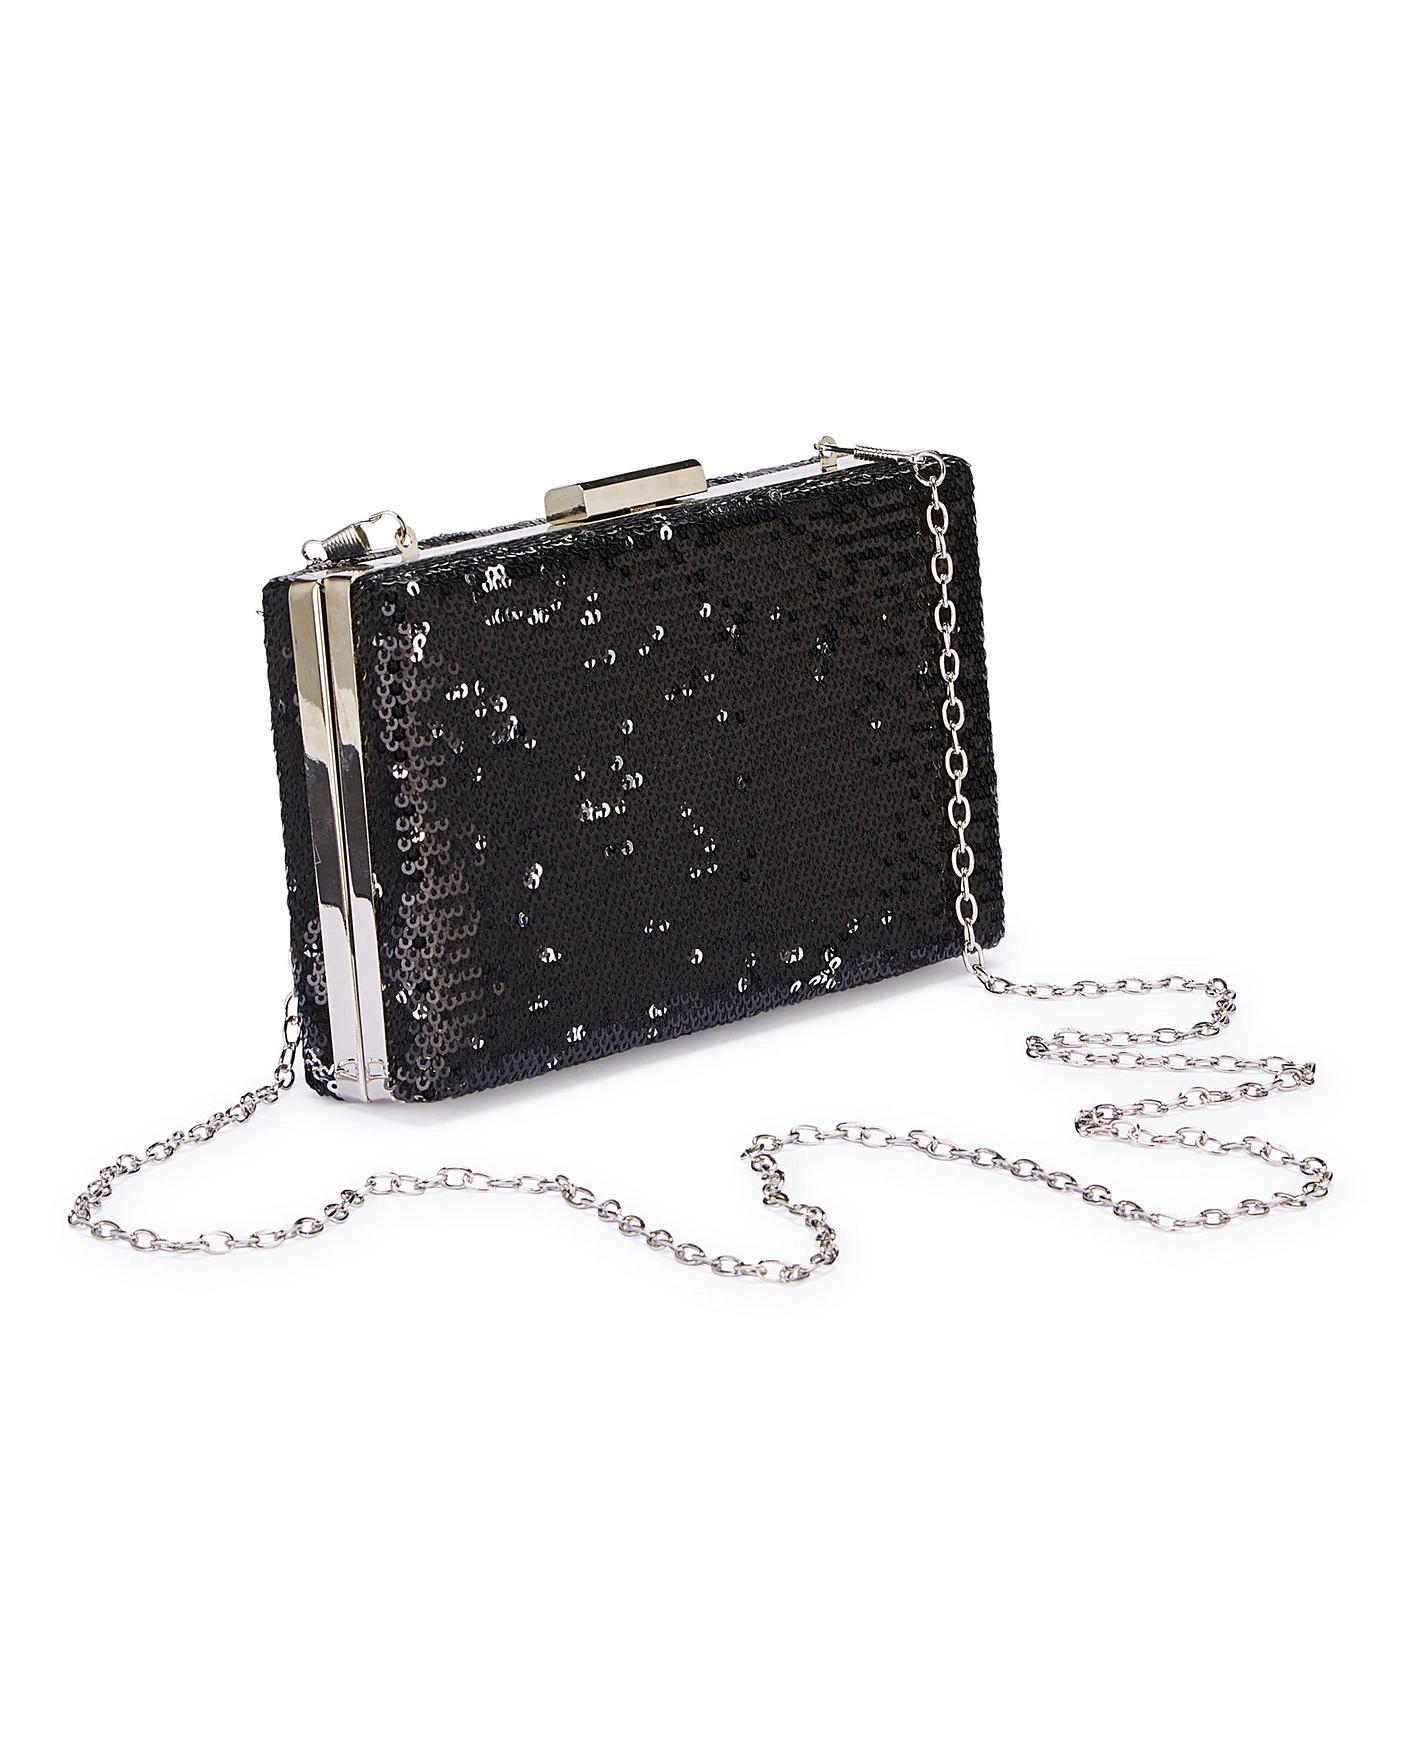 9b52fe5cbf2a Black Sequin Clutch Bag | Simply Be